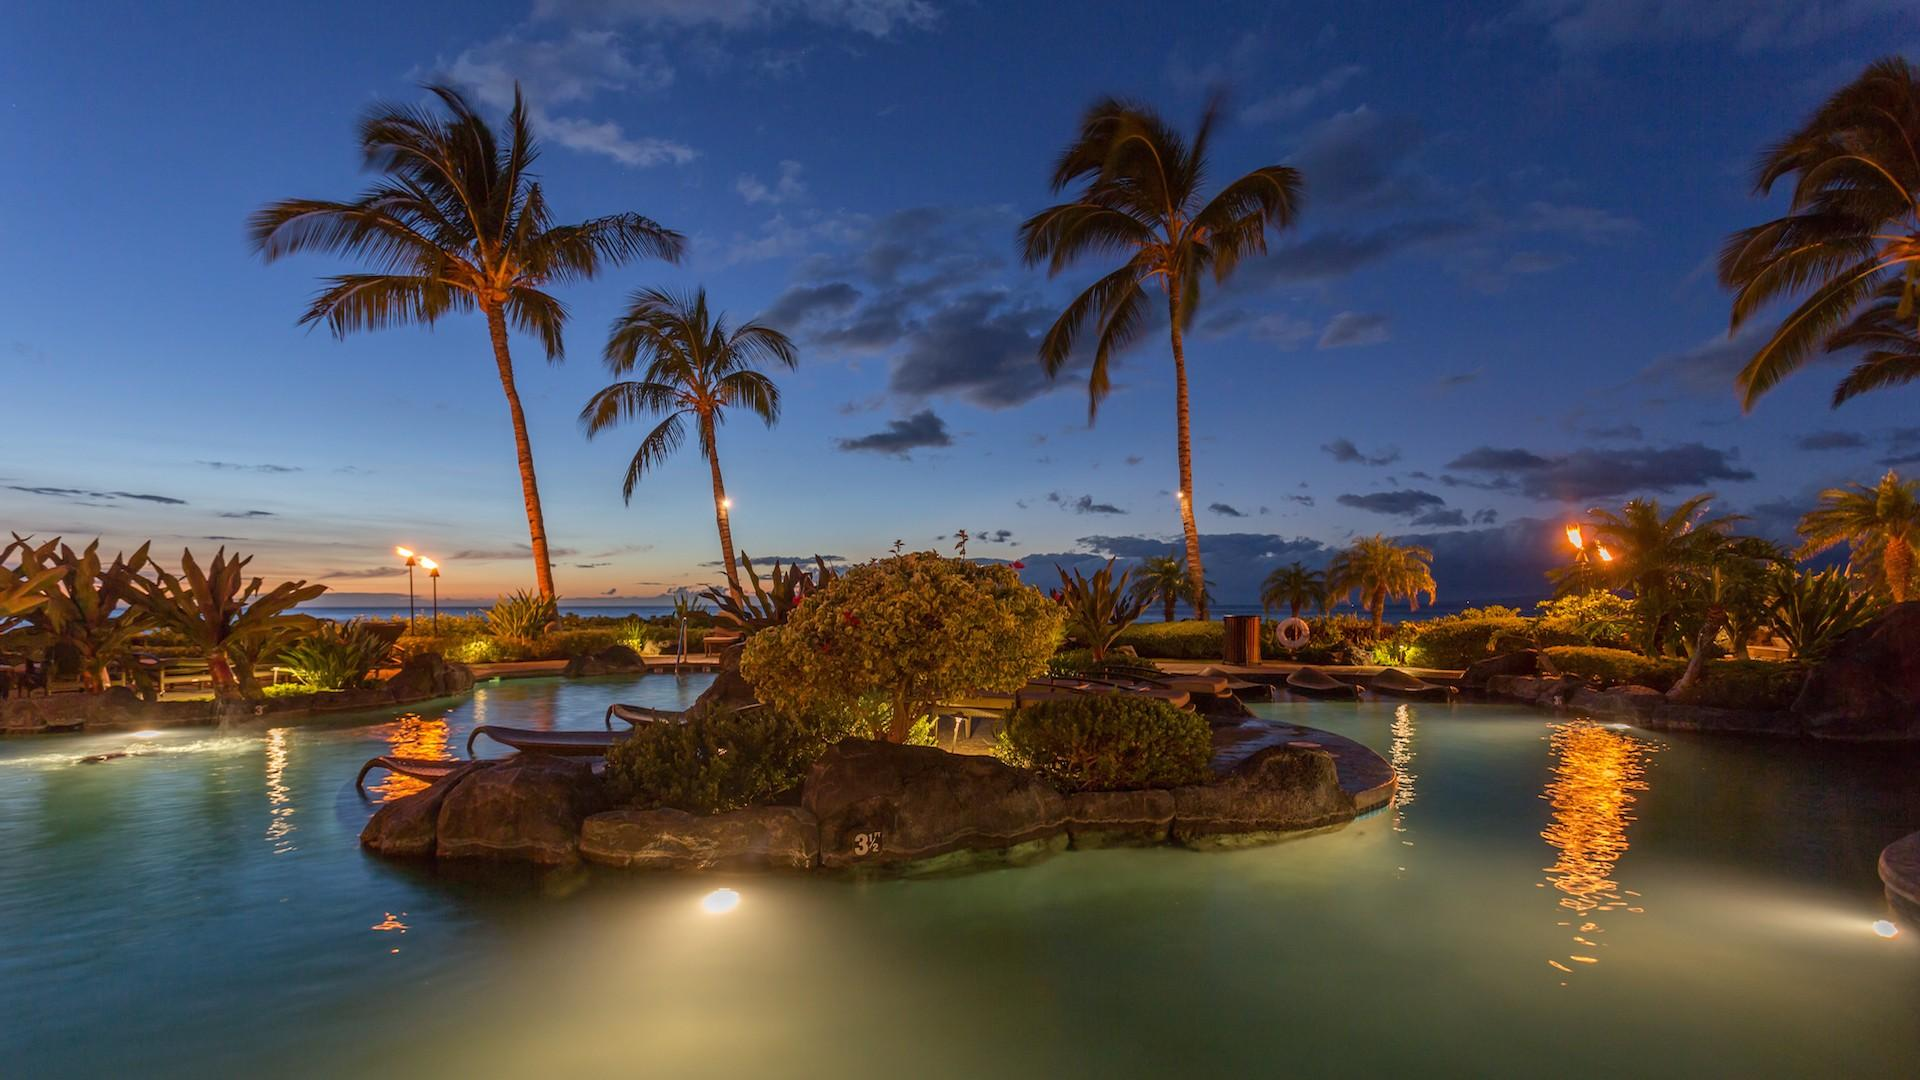 Hali'i Kai Resort's private lagoon-style saltwater pool at dusk.